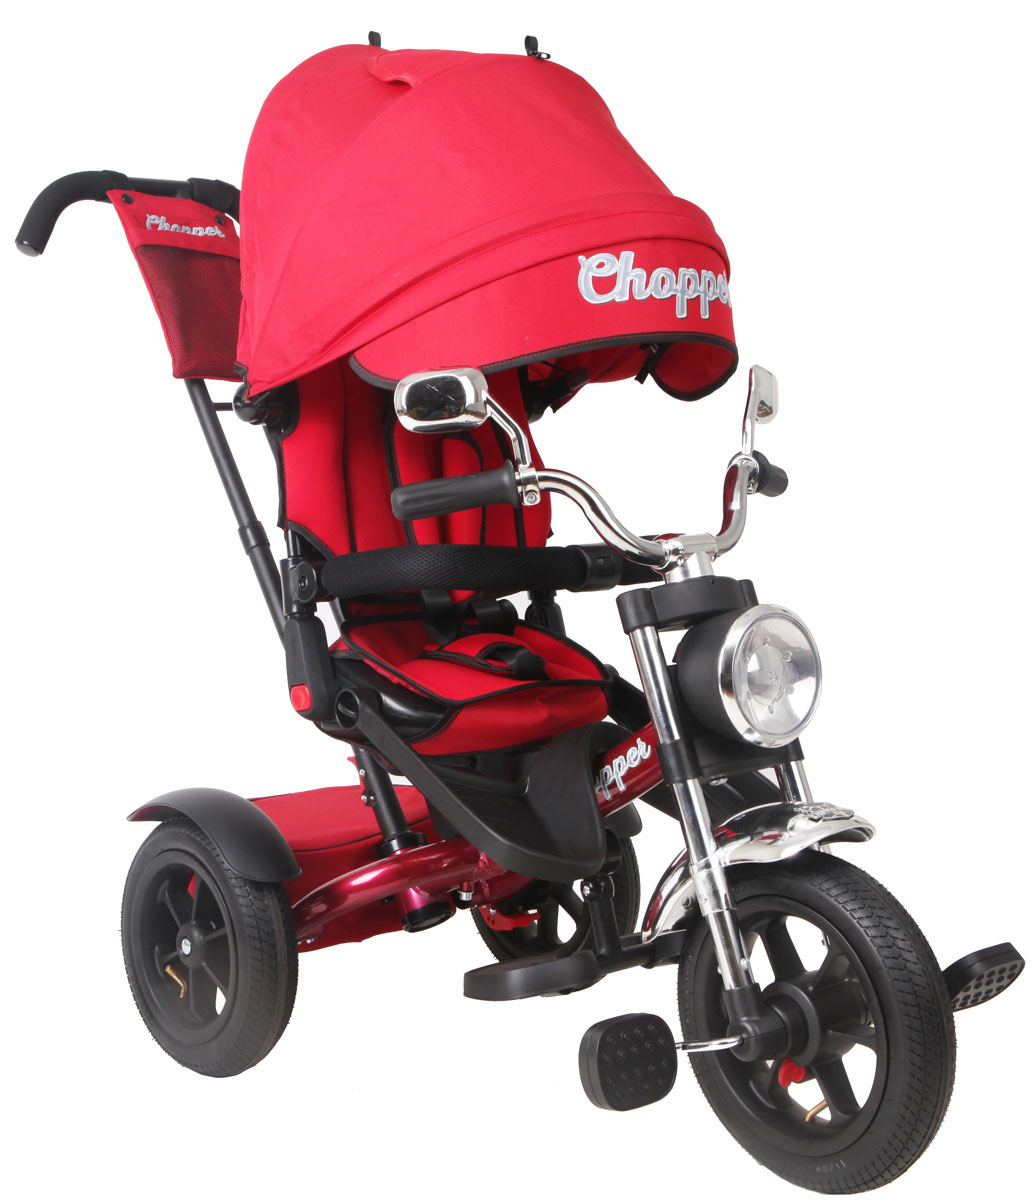 Chopper Велосипед трехколесный цвет красный CH1R велосипед трехколесный с ручкой chopper ch1mb черный